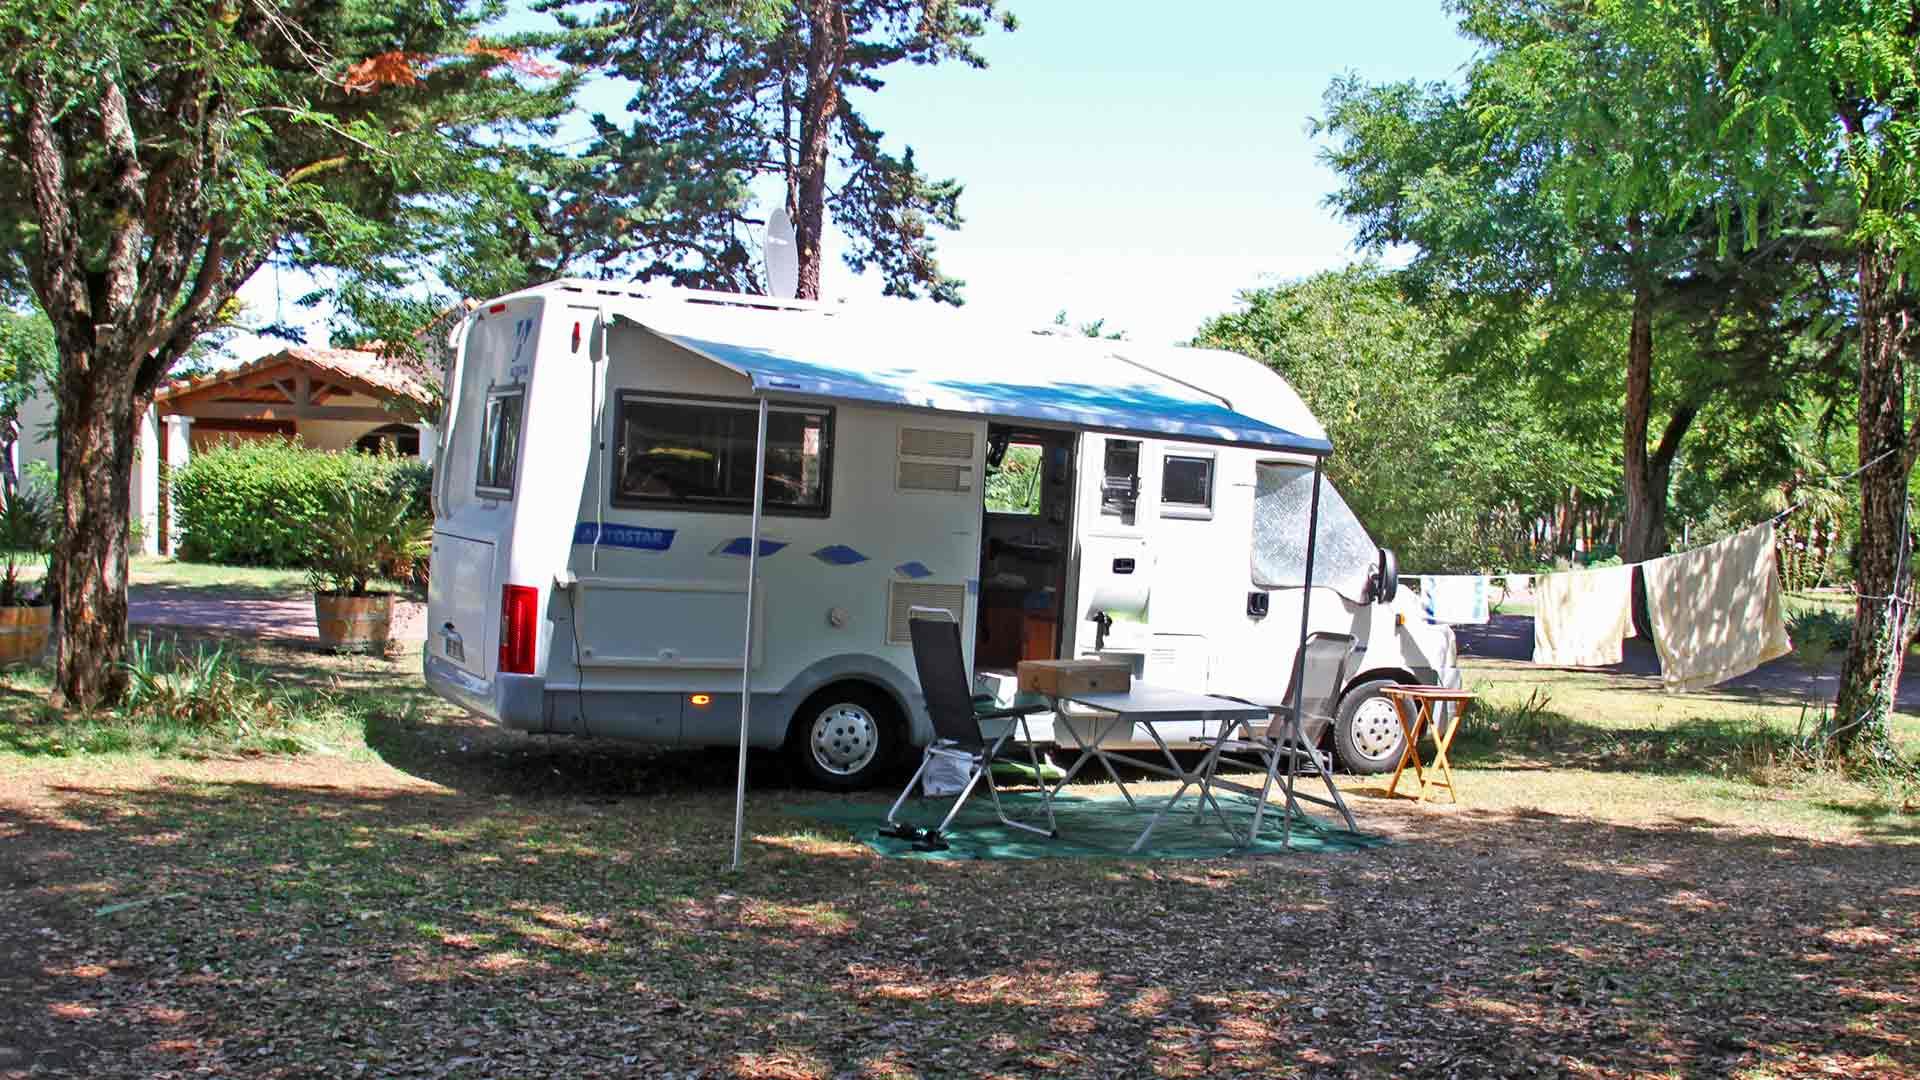 Camping La Brande Ile D'Oleron Emplacement Camping Car